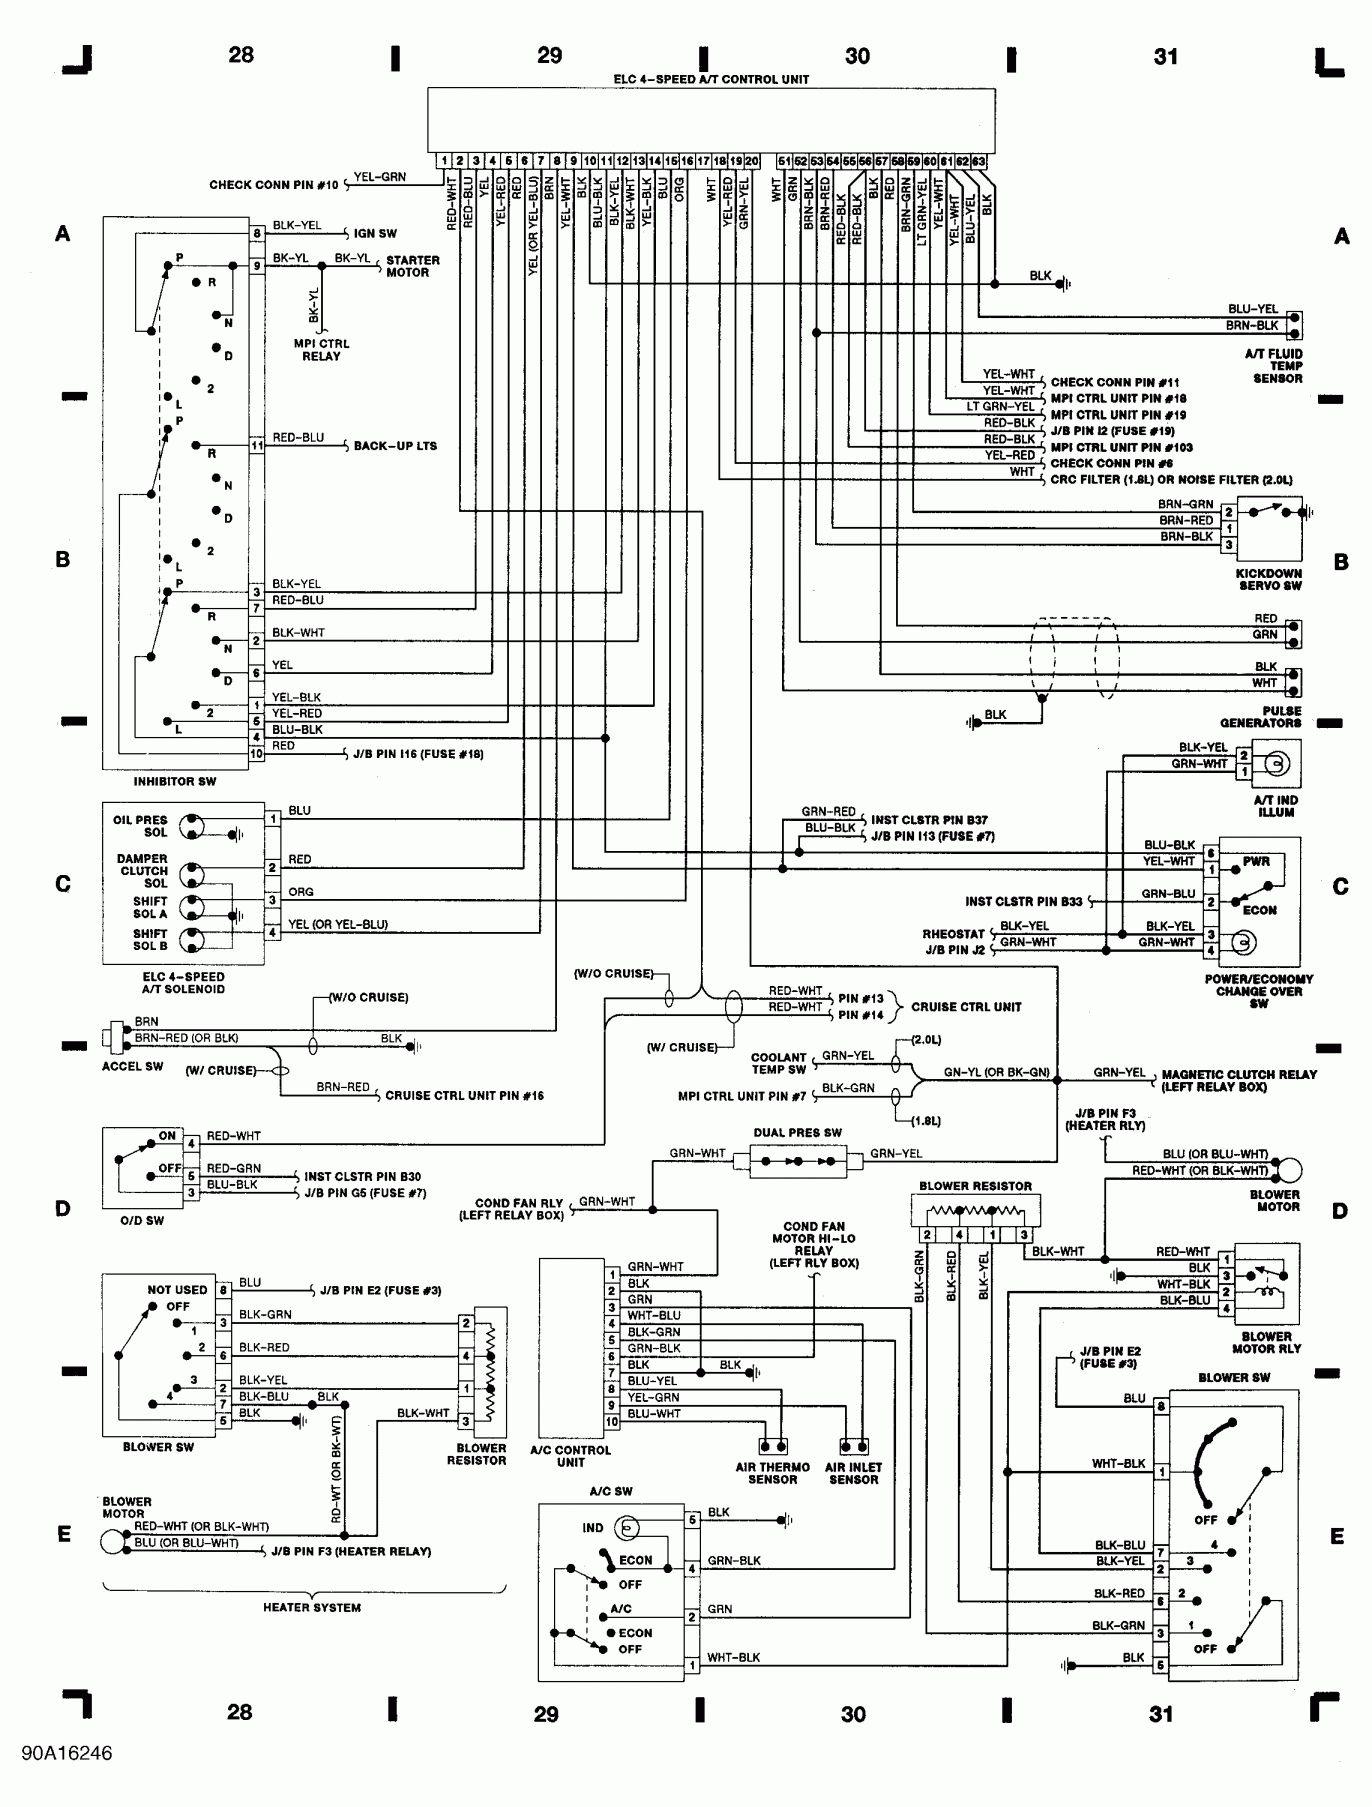 [DIAGRAM] Cat 3126 Wiring Diagram